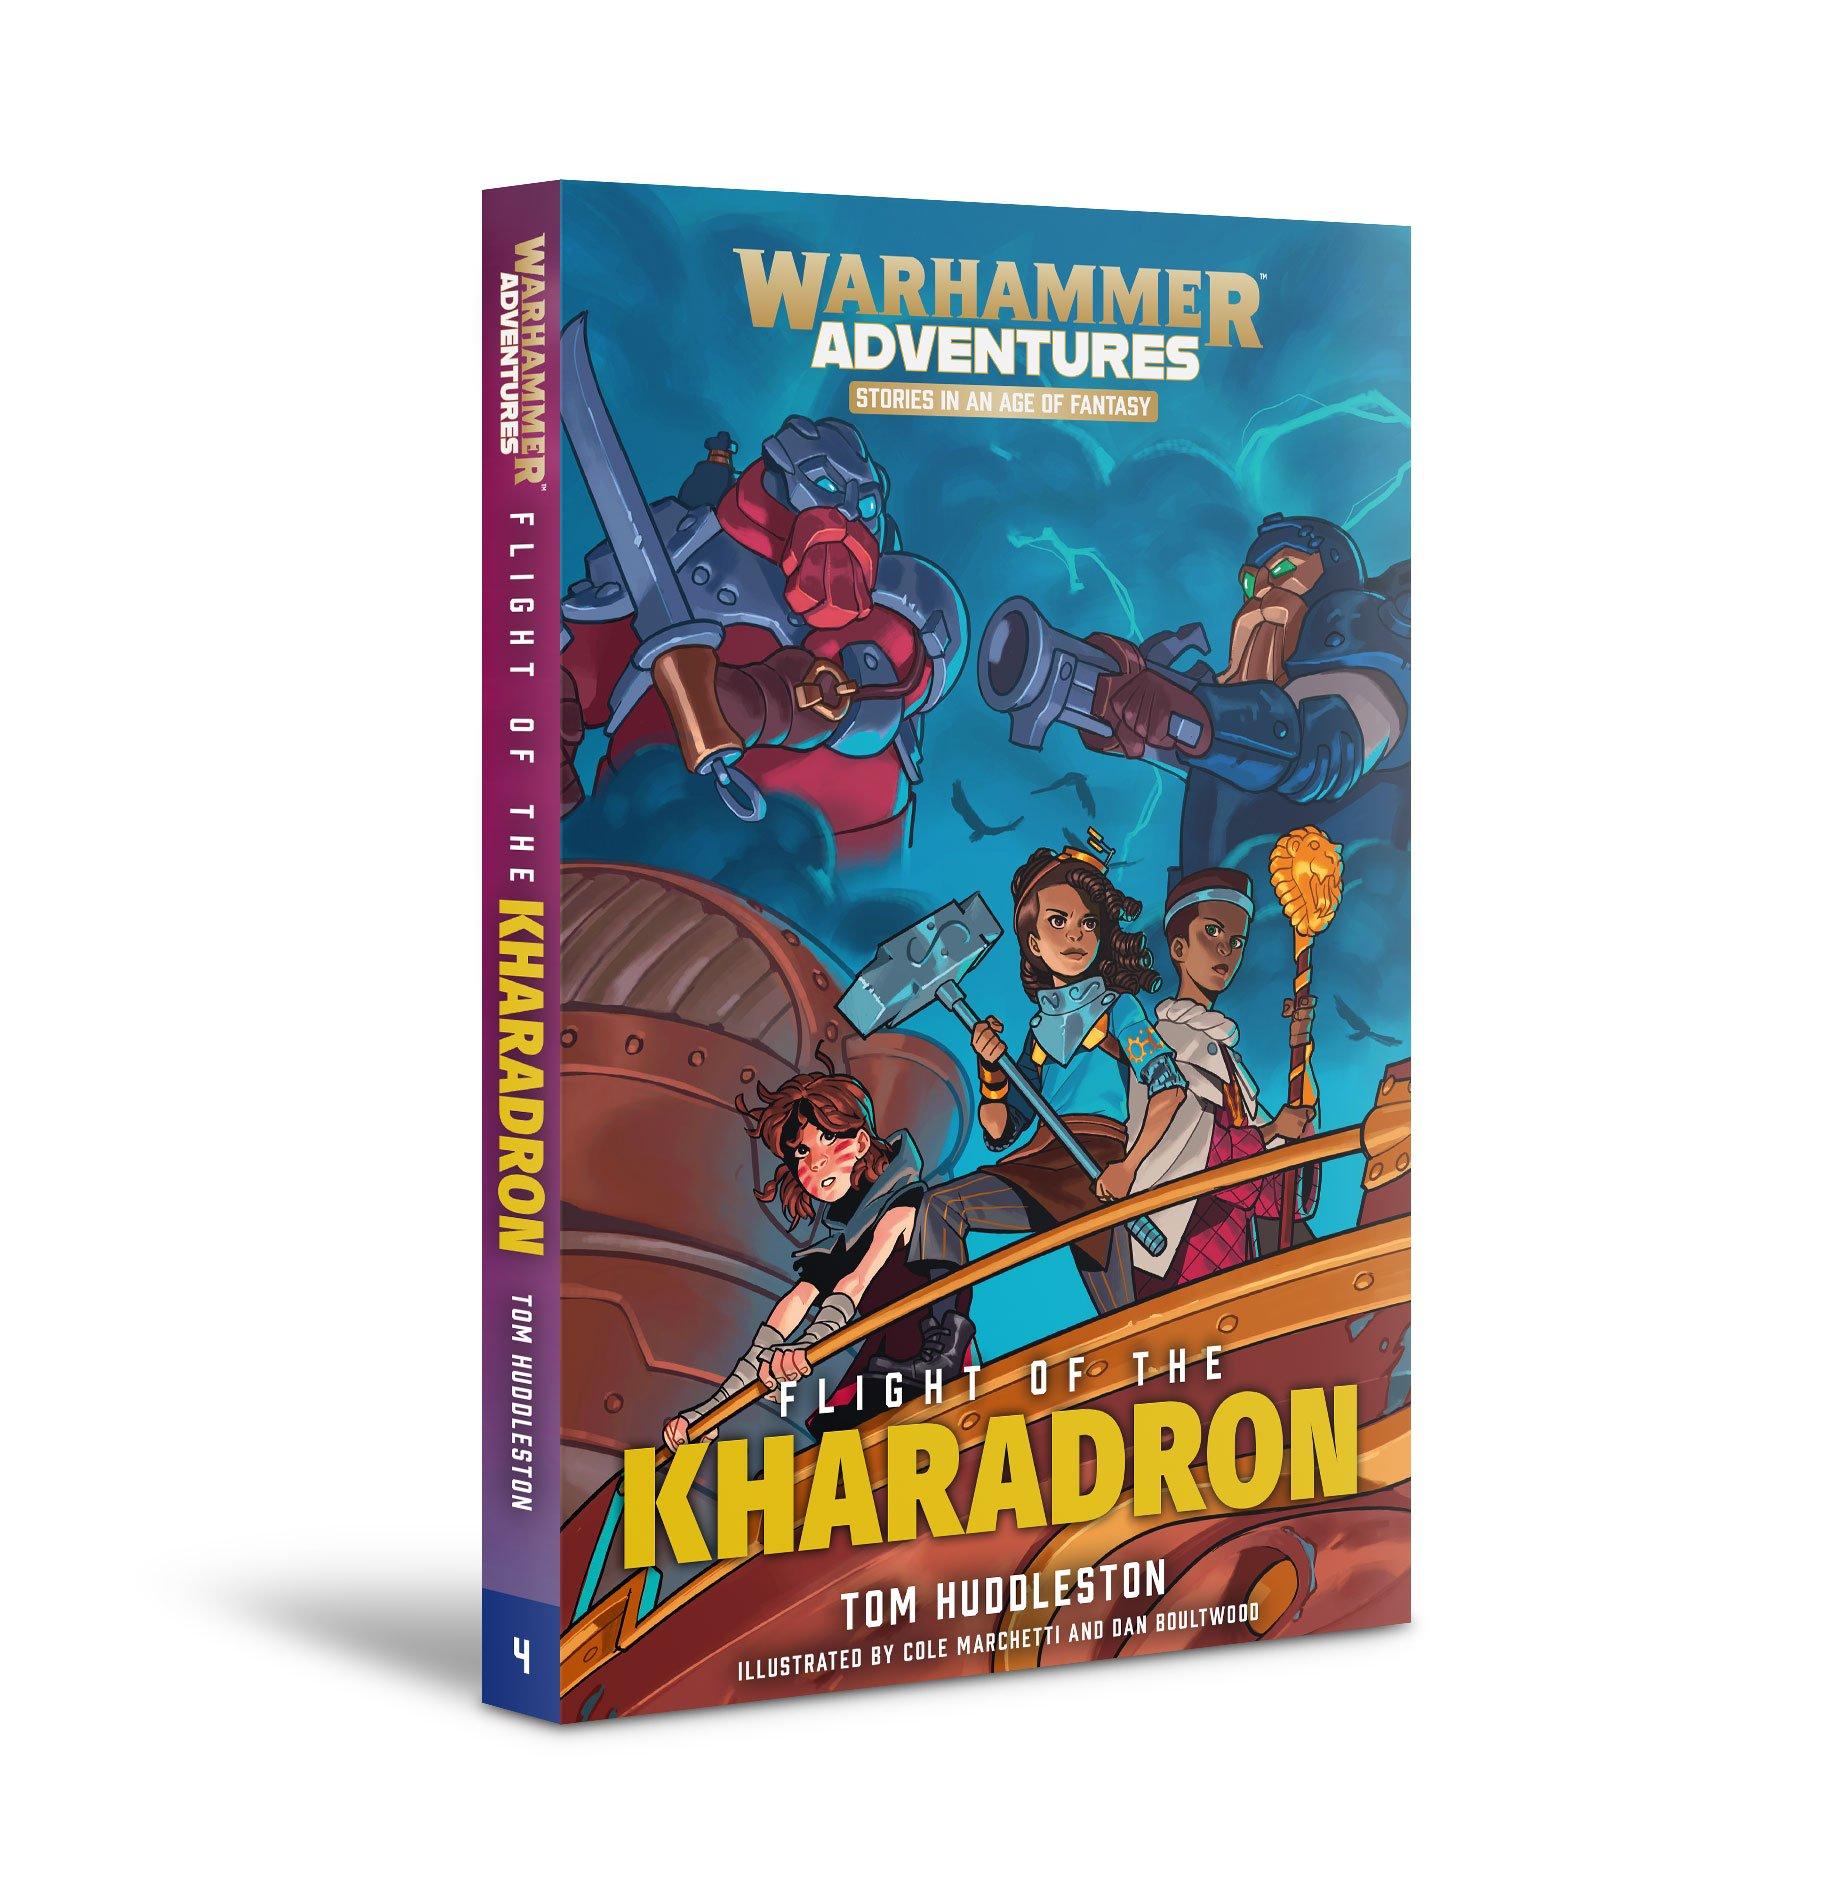 Flight of the Kharadron, Black Library